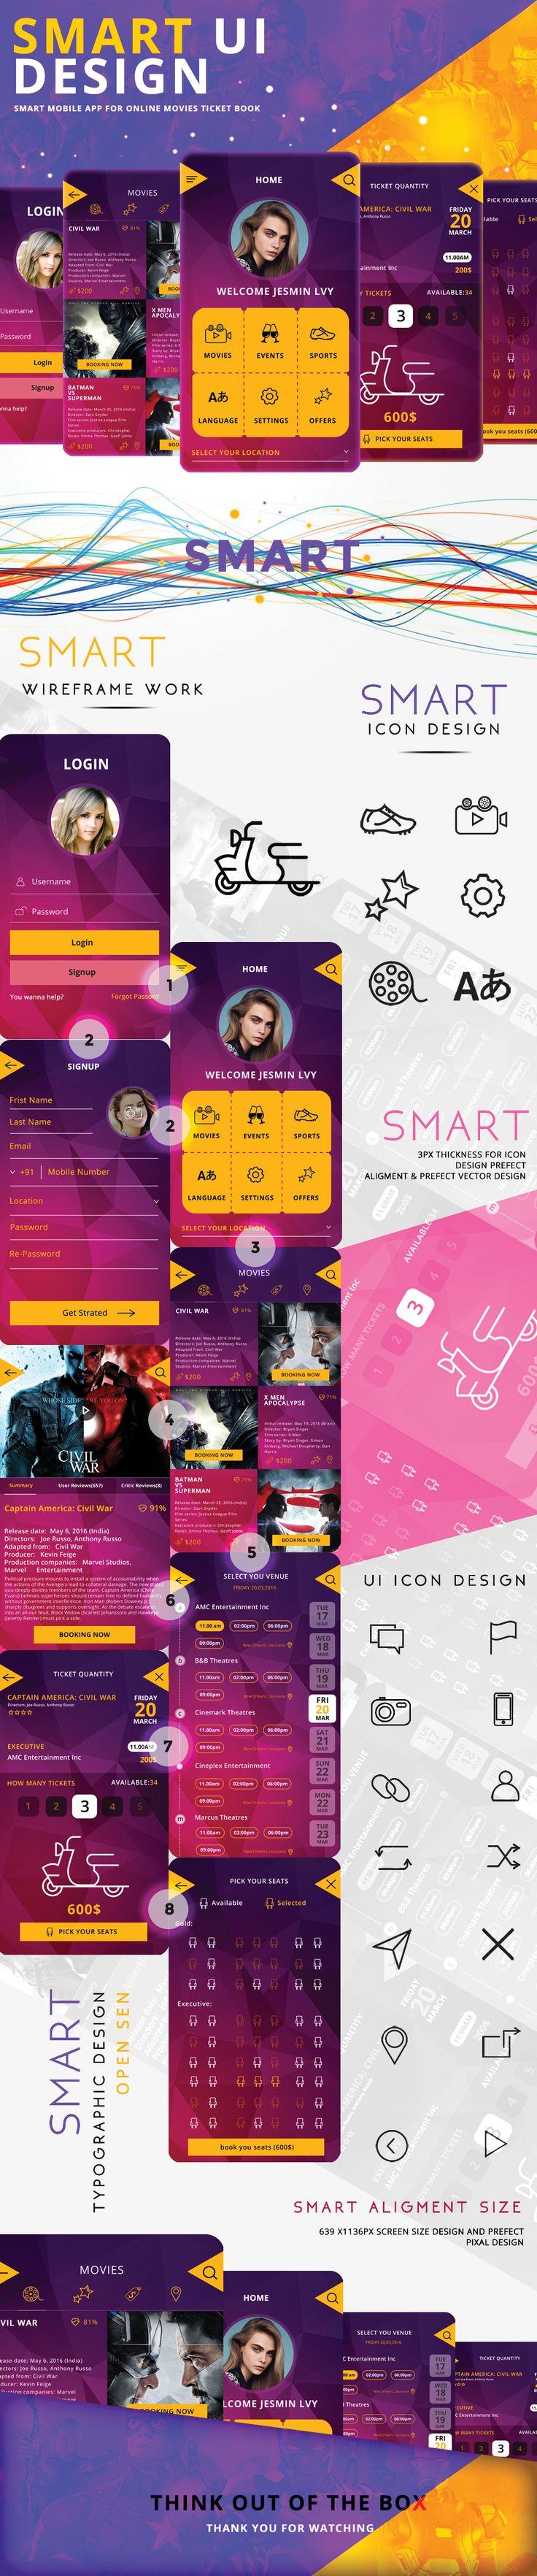 smart UI design on Behance